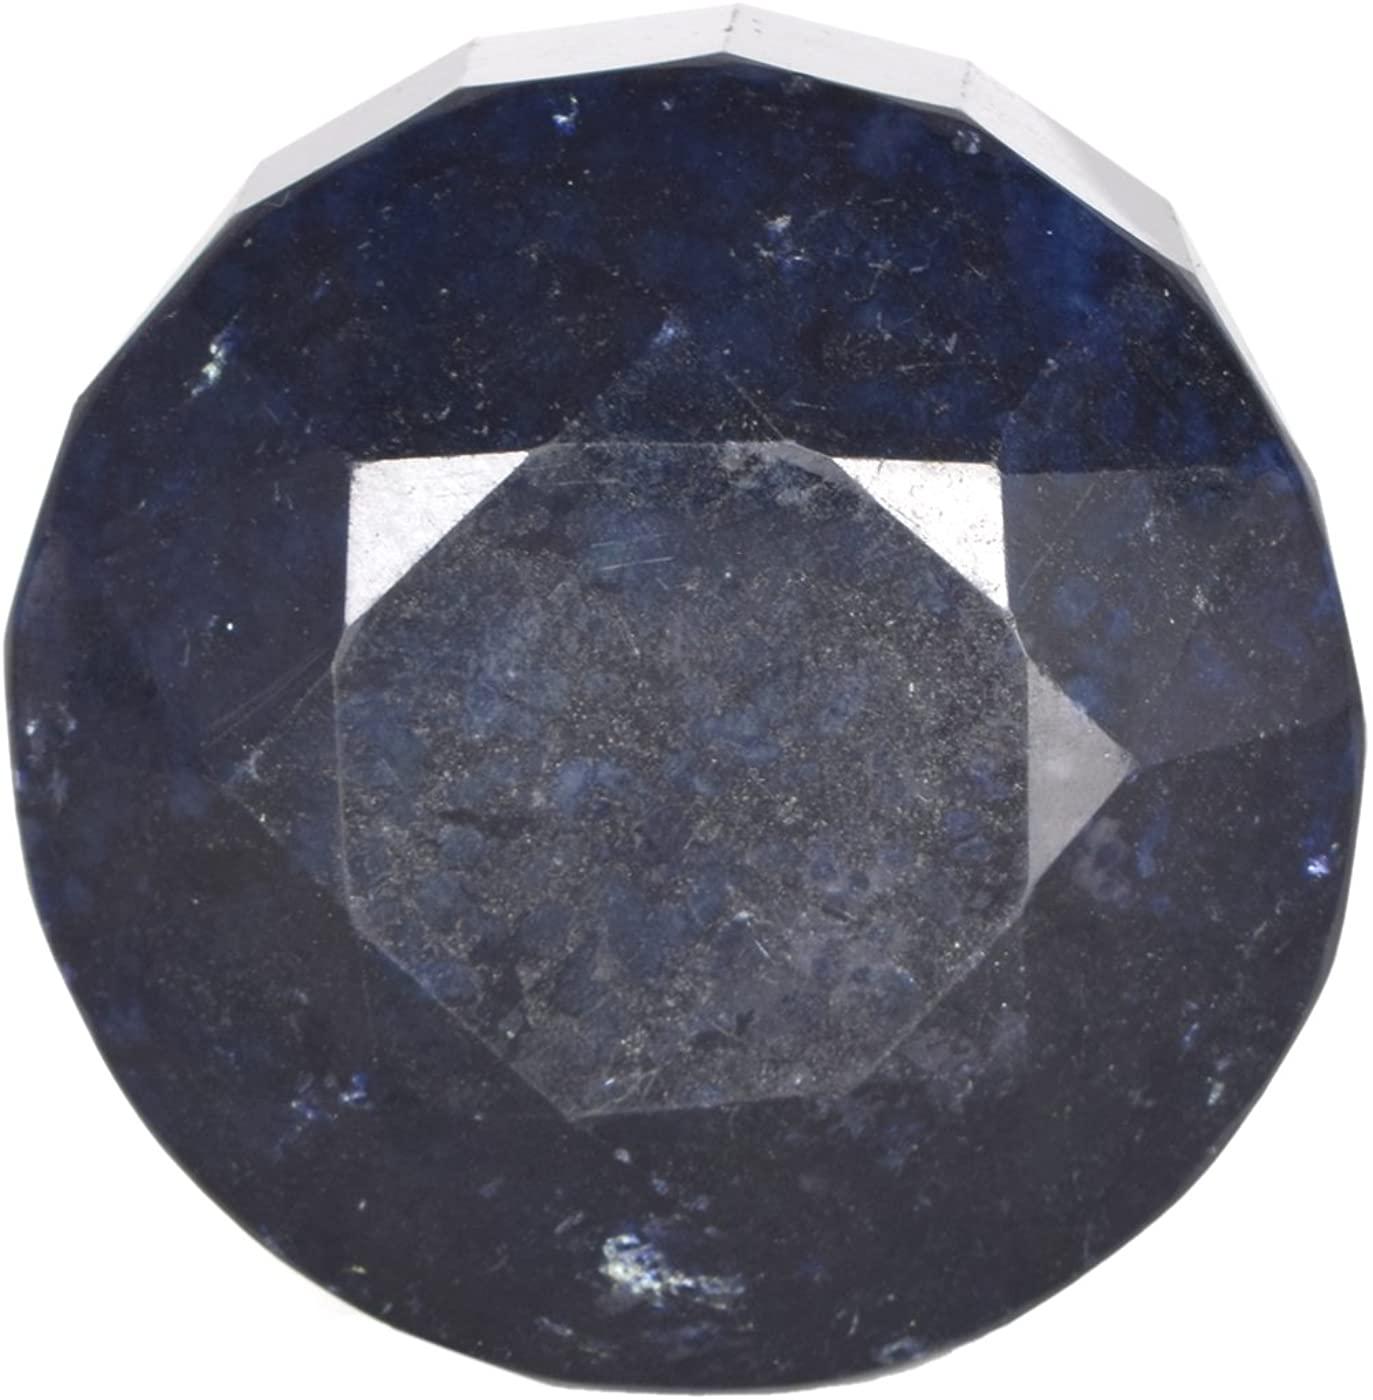 Natural Egl certified 2056.5 Ct. African Oval Cut Huge Blue Sapphire Gemtone